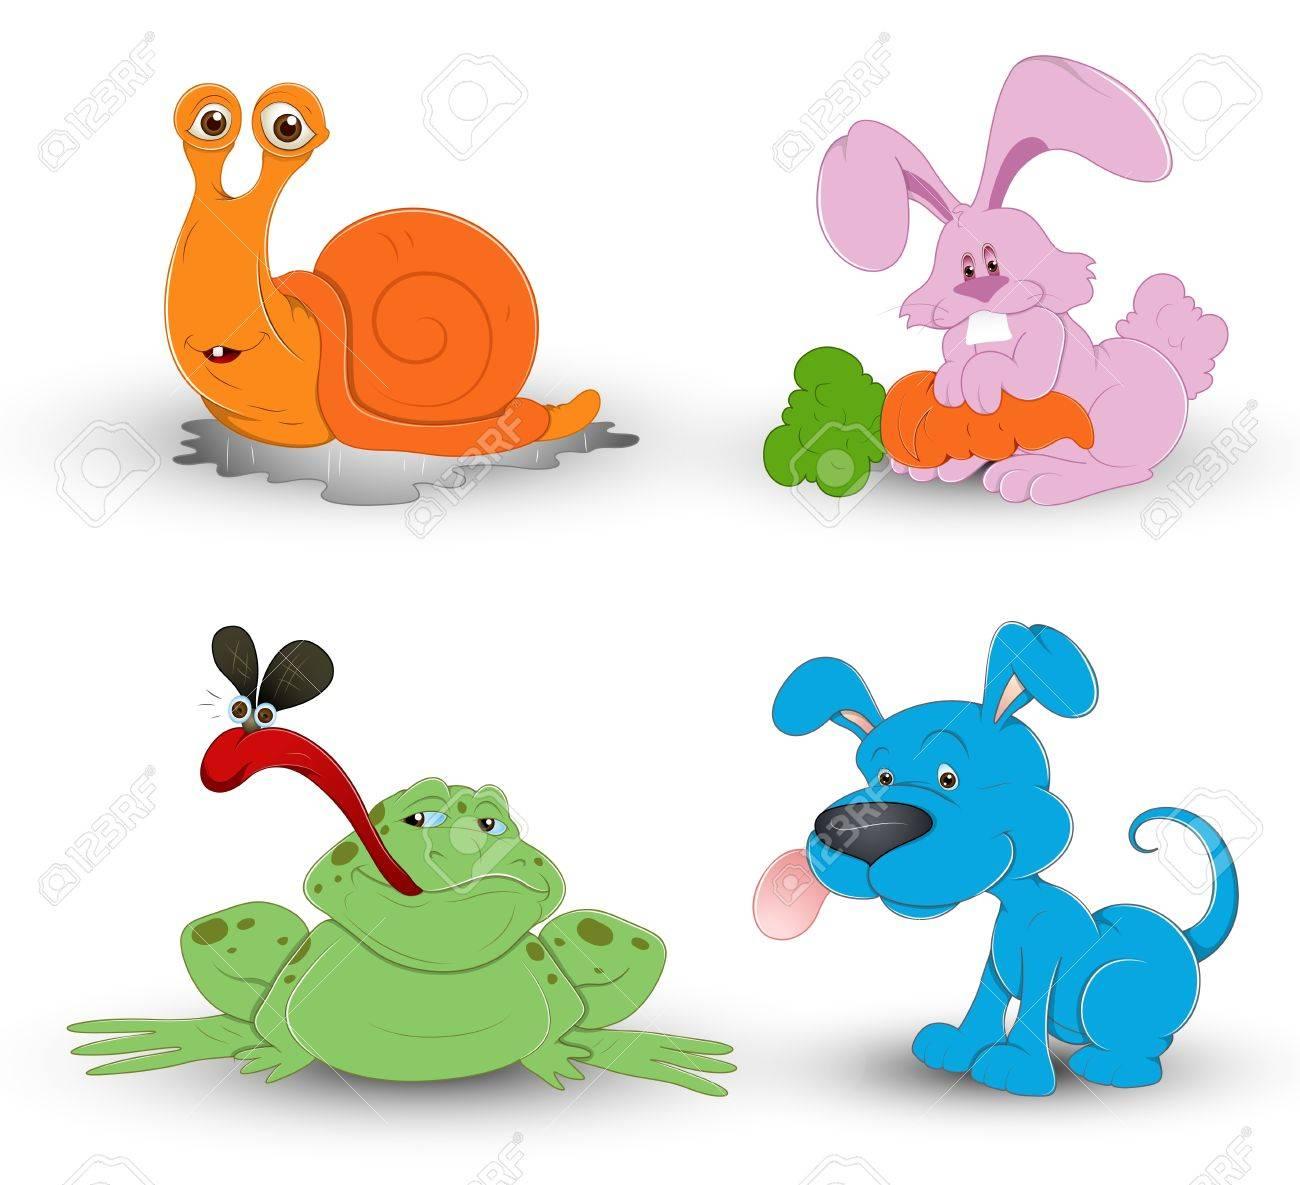 Cute Cartoon Animals Stock Vector - 13358215